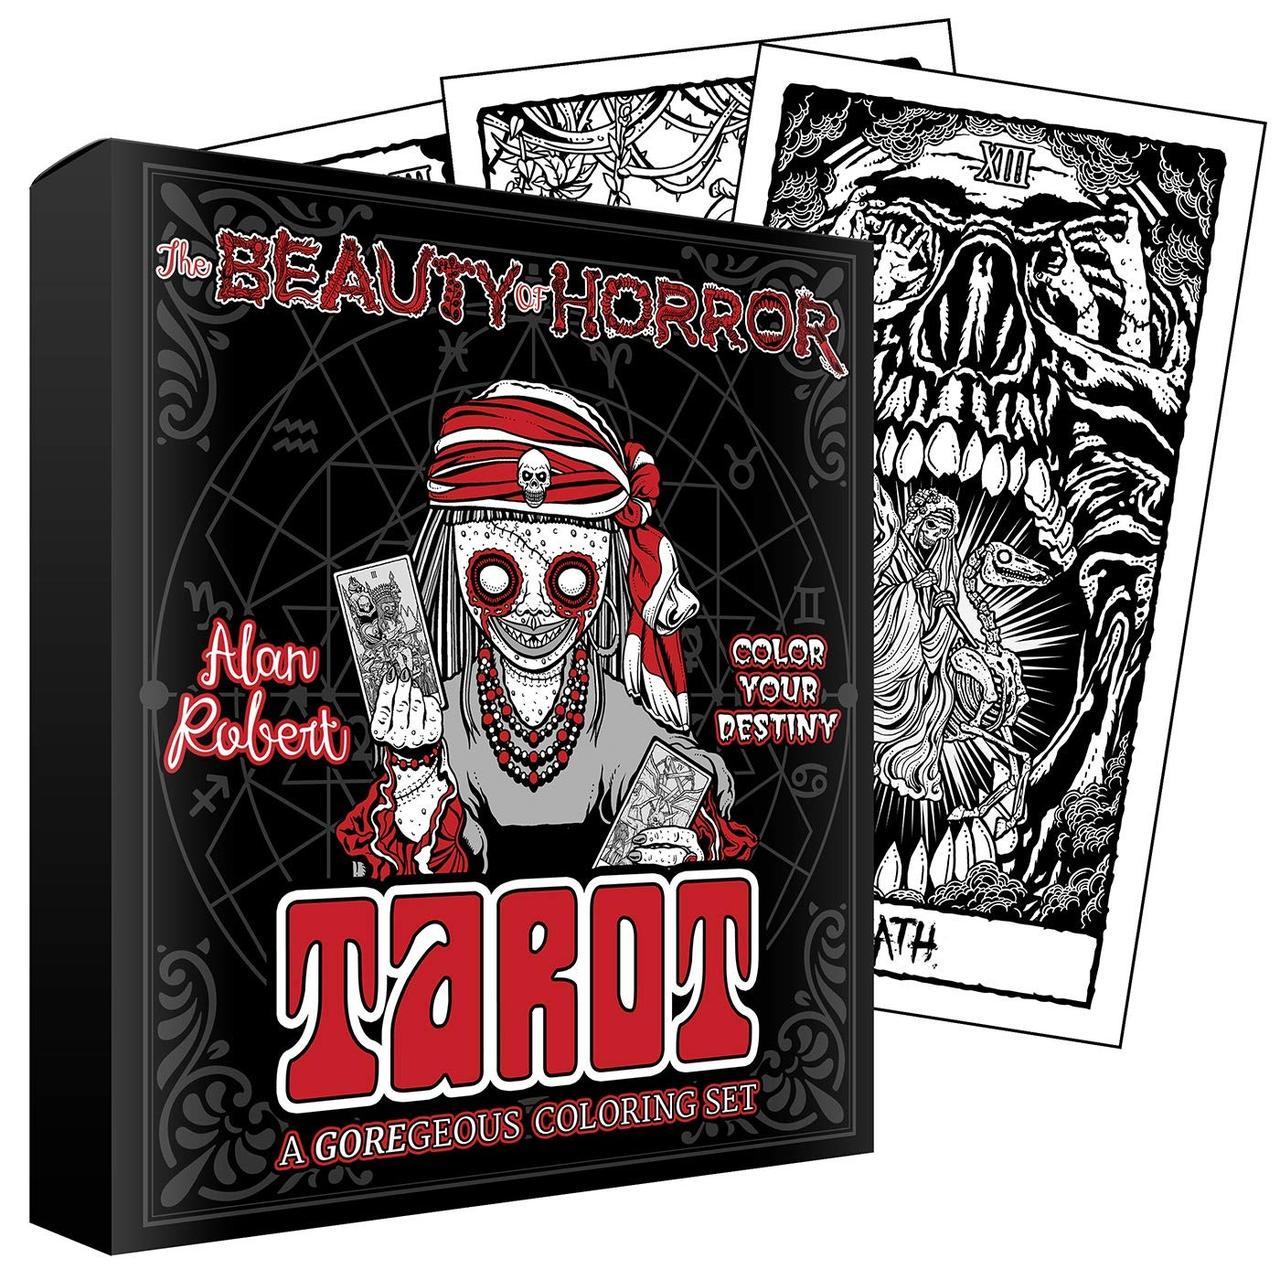 The Beauty of Horror: Color Your Destiny Tarot/ Красота ужаса: Таро Раскрась Свою Судьбу